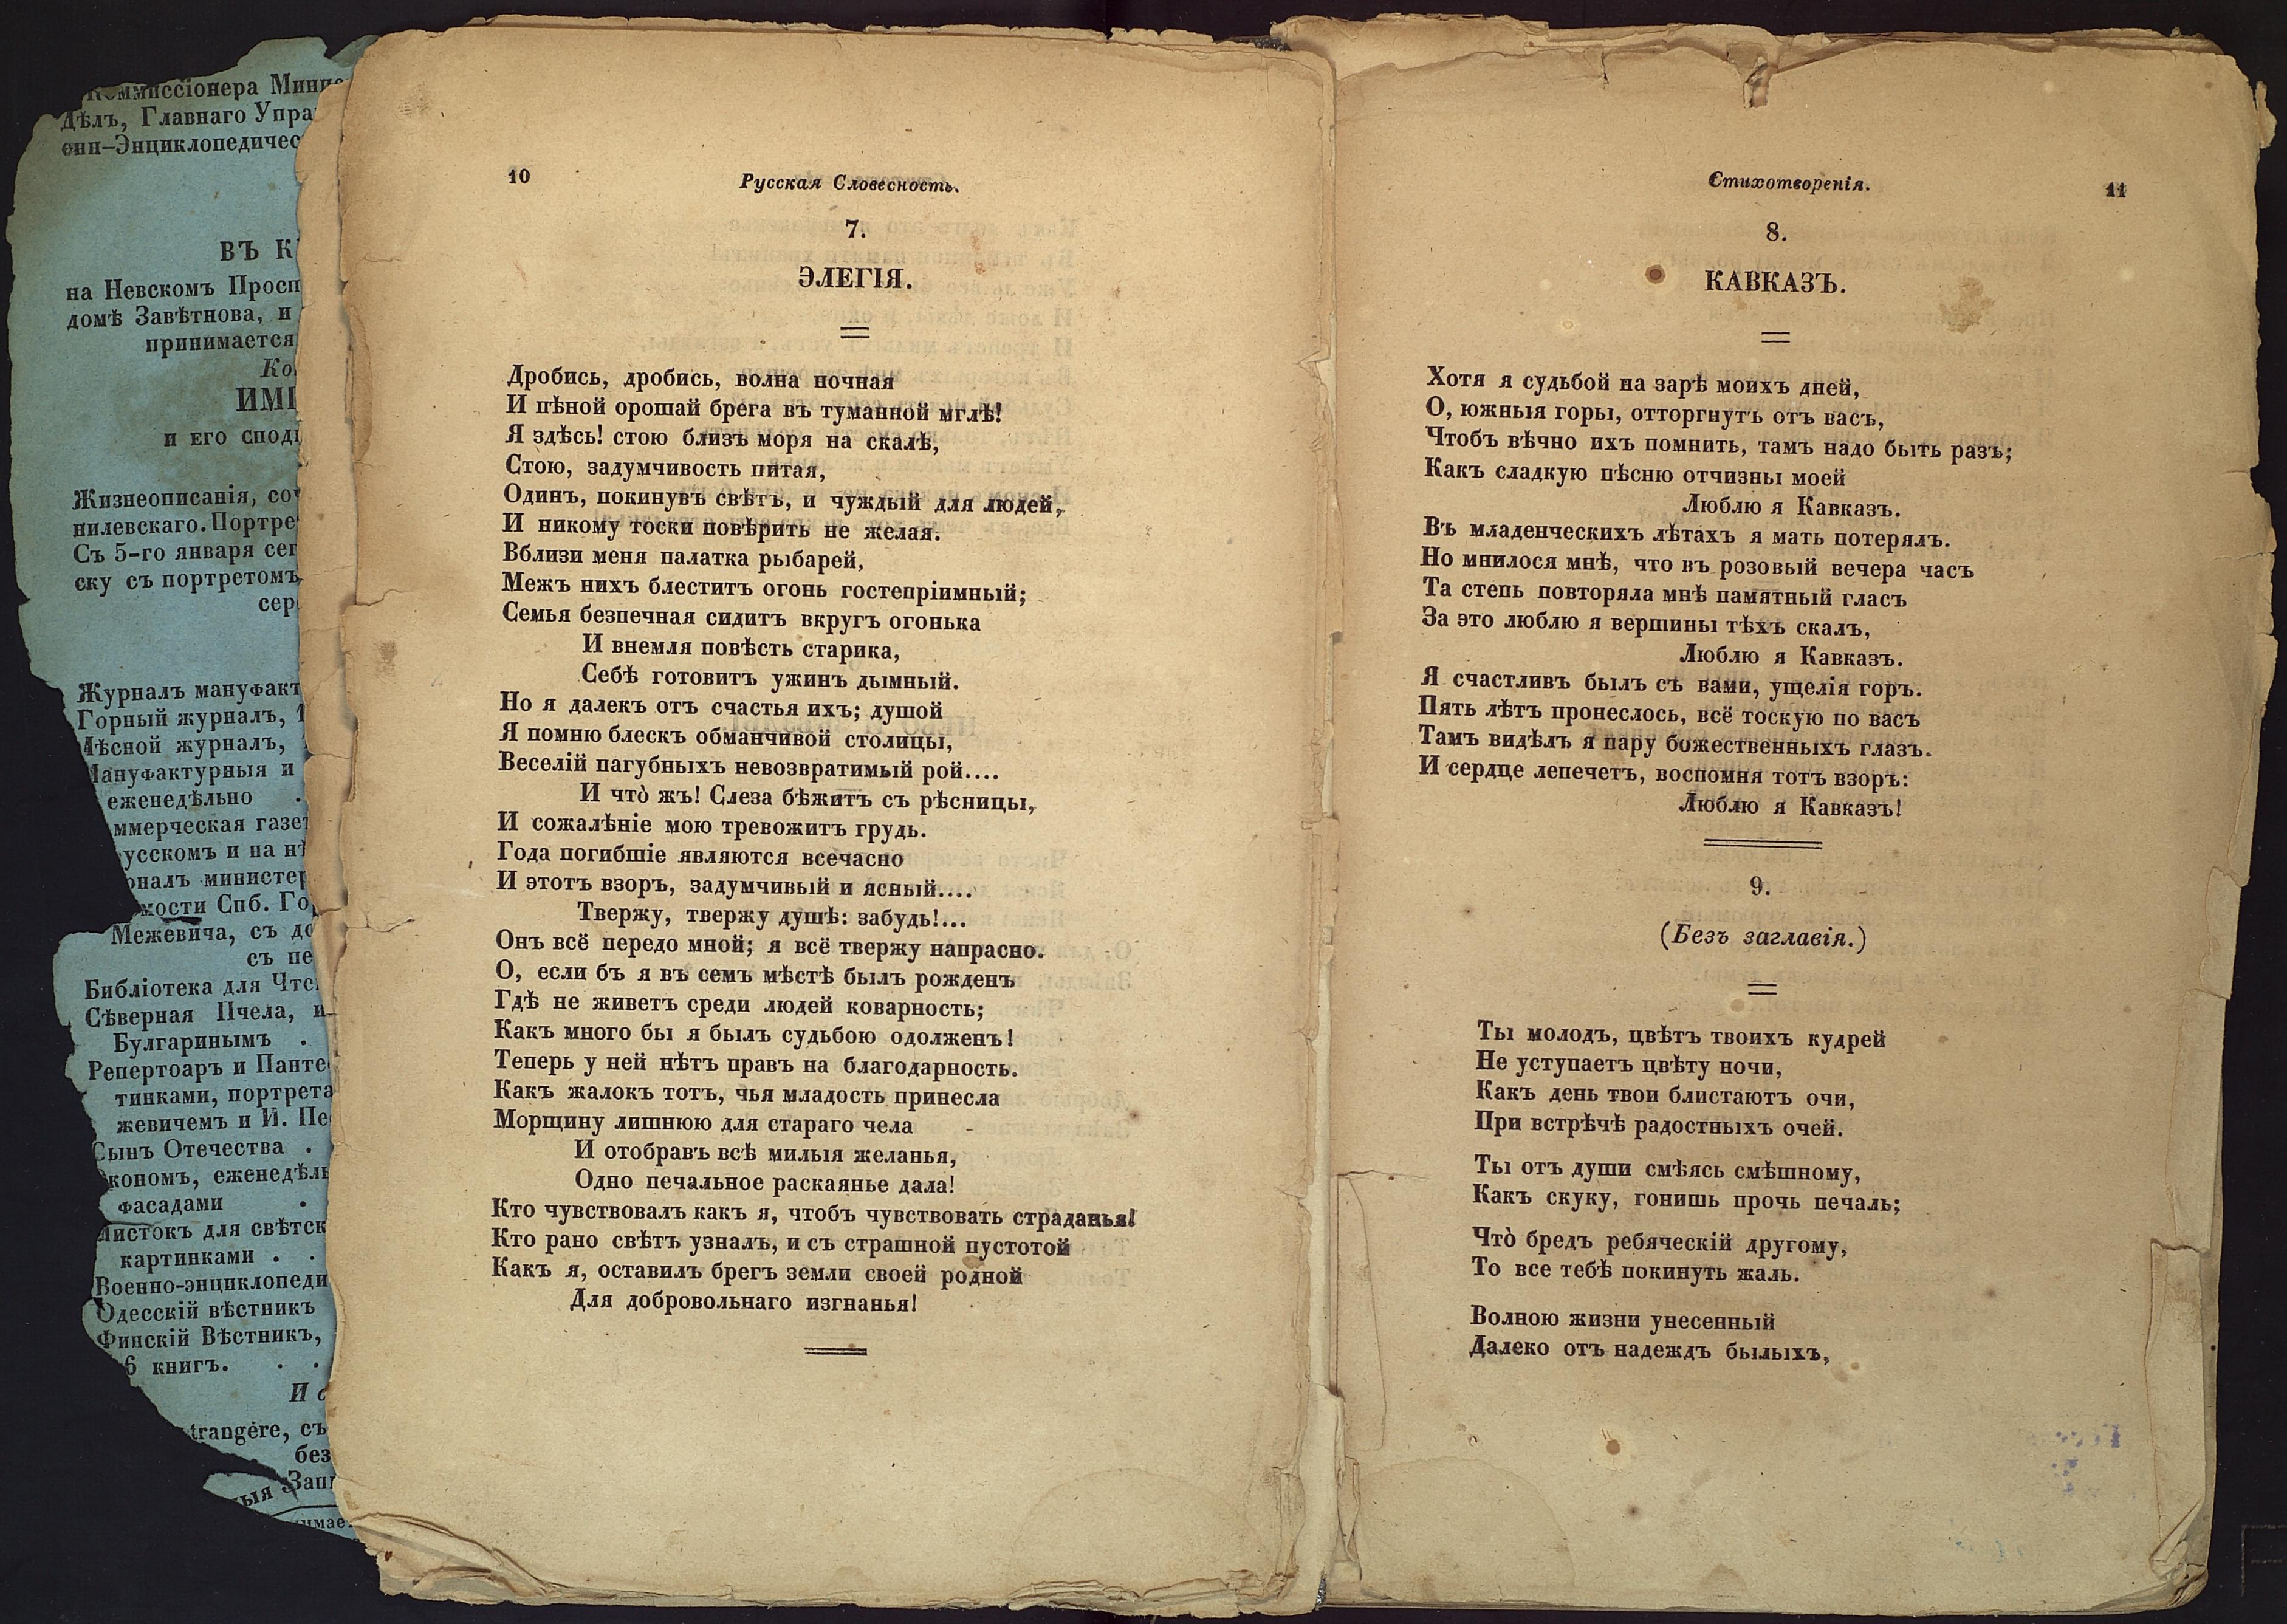 ЛОК-5119 ТАРХАНЫ КП-11026  Журнал Библиотека для чтения. Т. 68._5